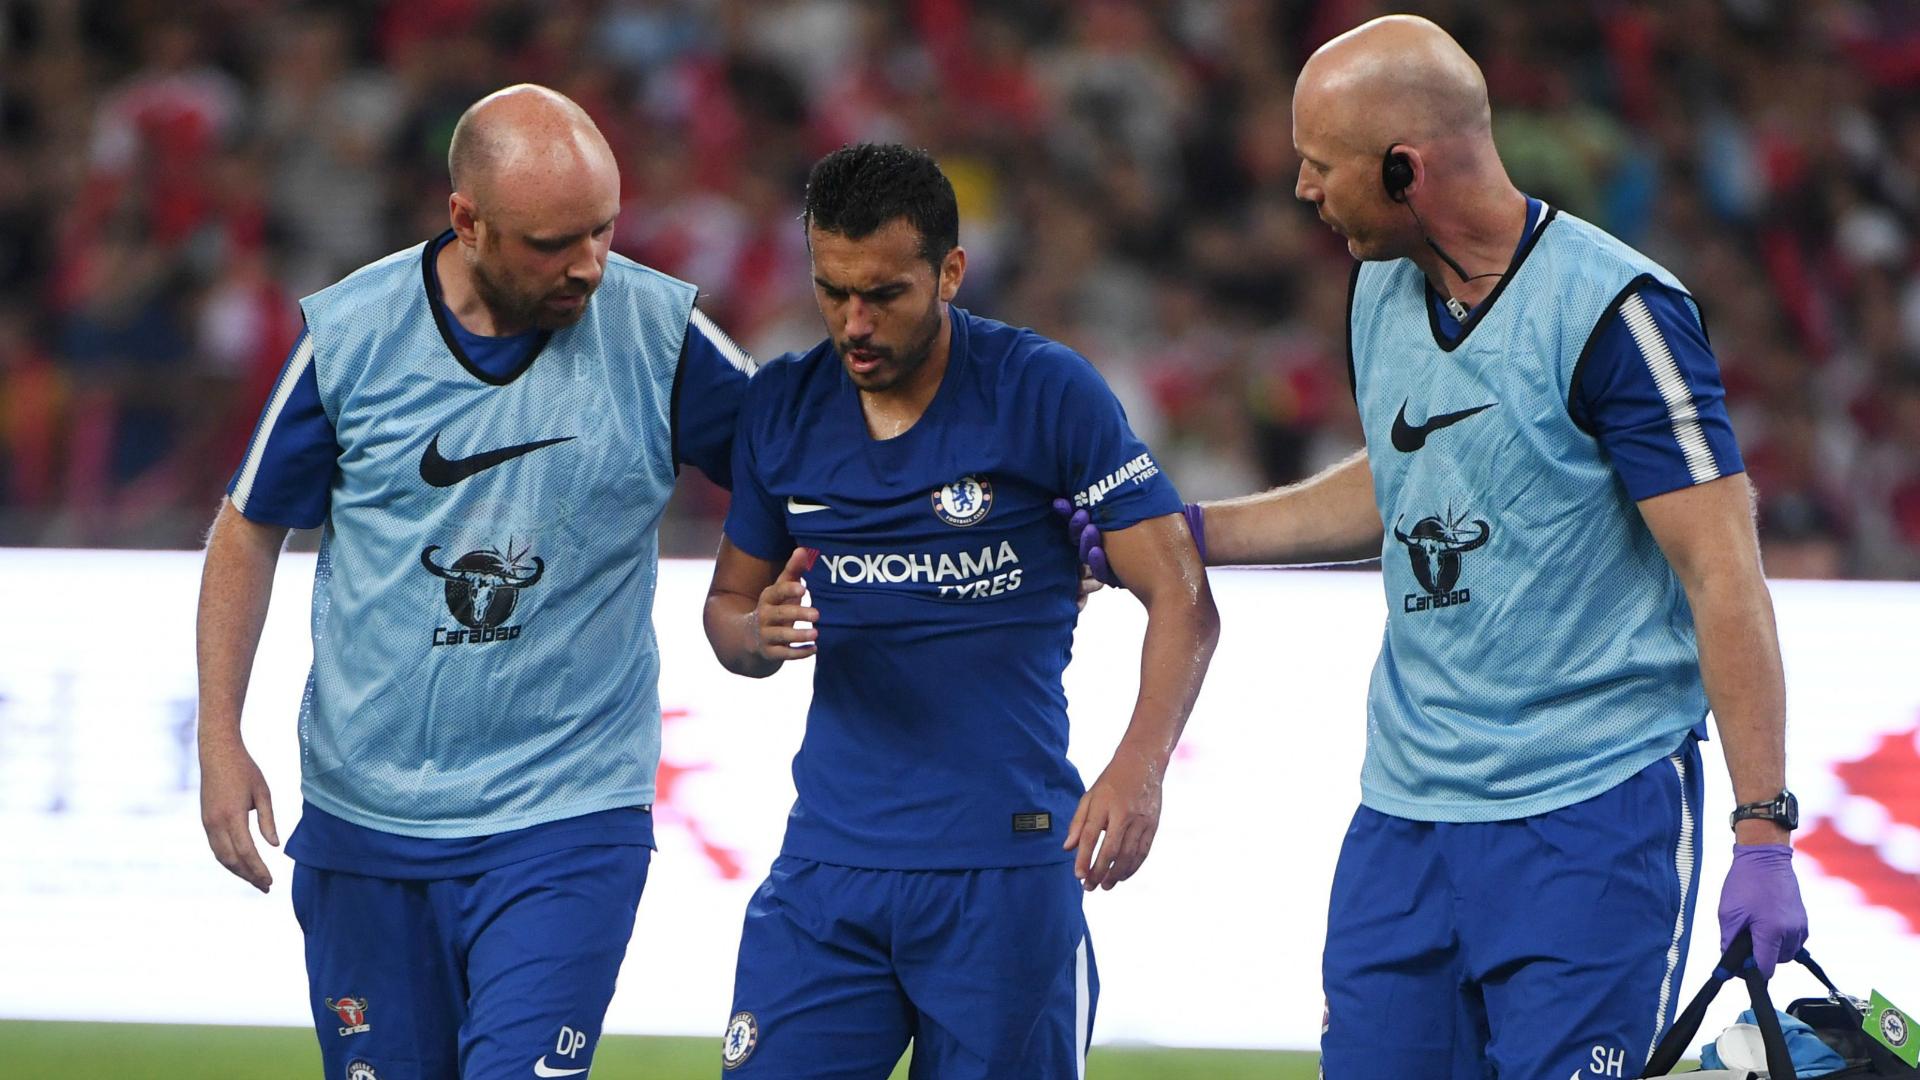 Pedro Rodríguez Ledesma Chelsea International Champions Cup 07222017